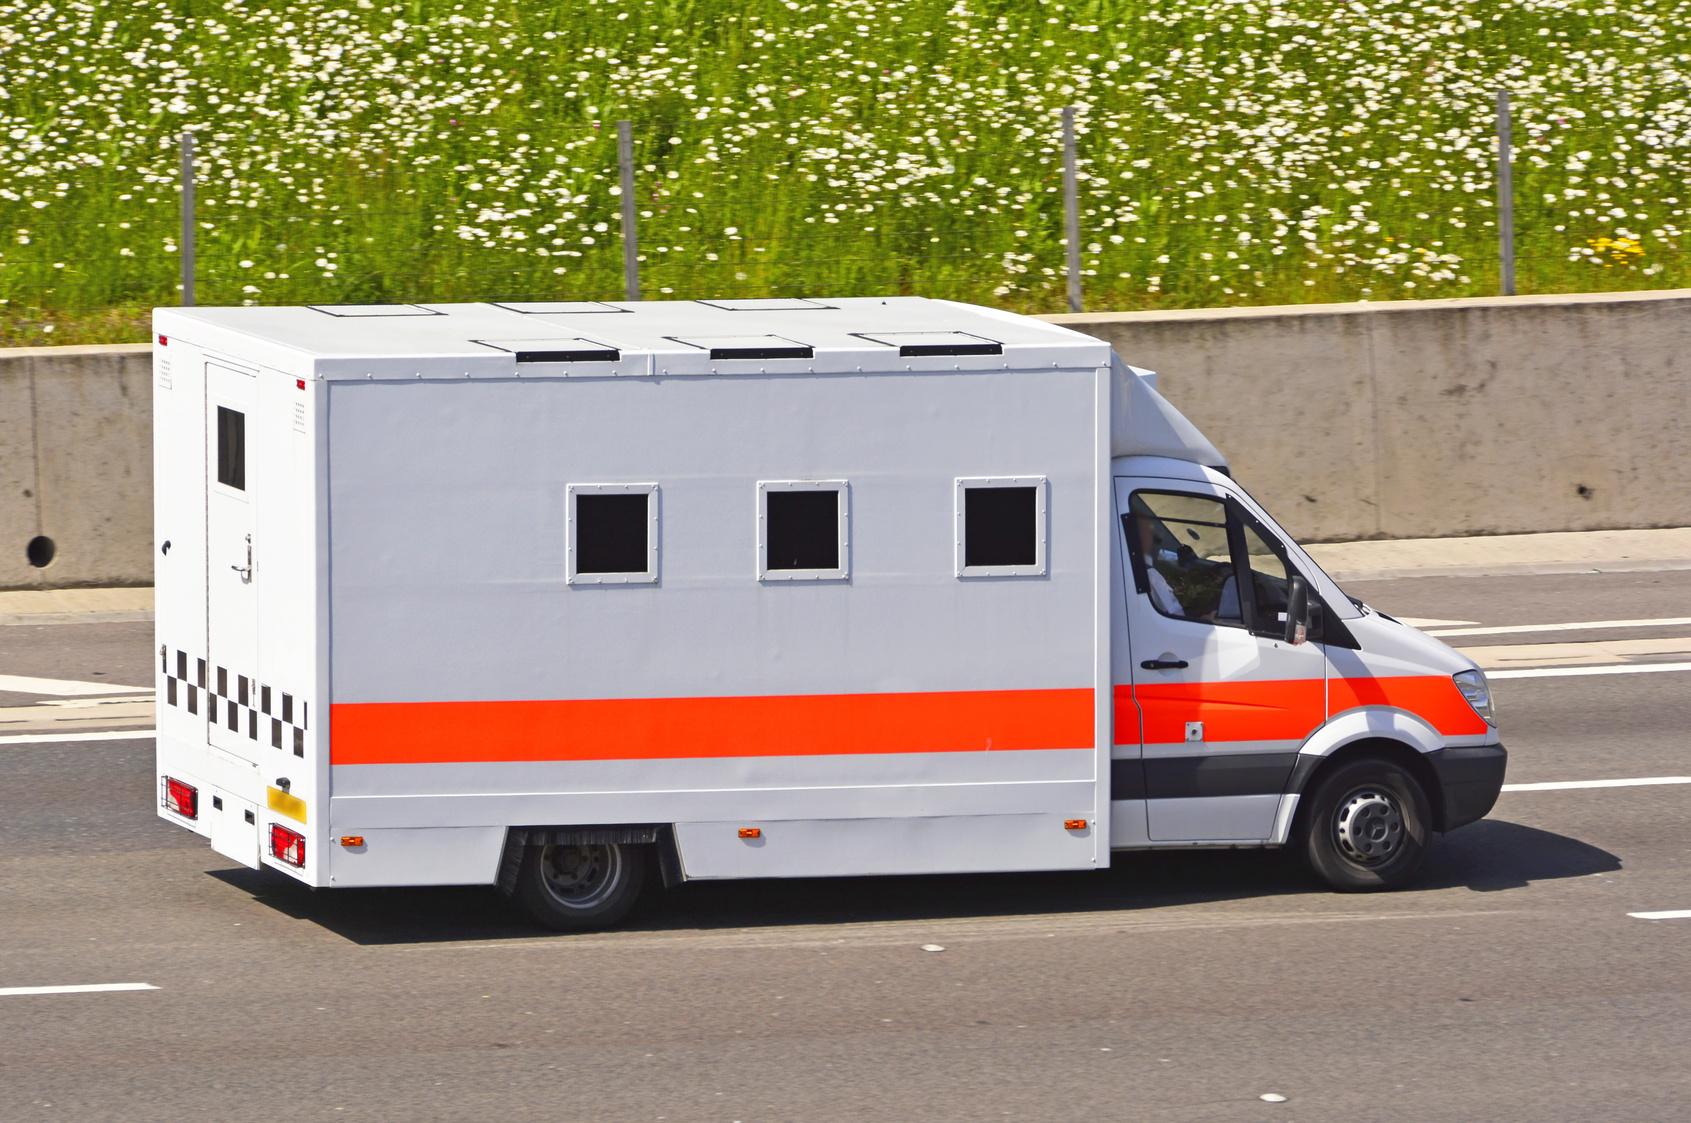 NOMS careers guide prison van